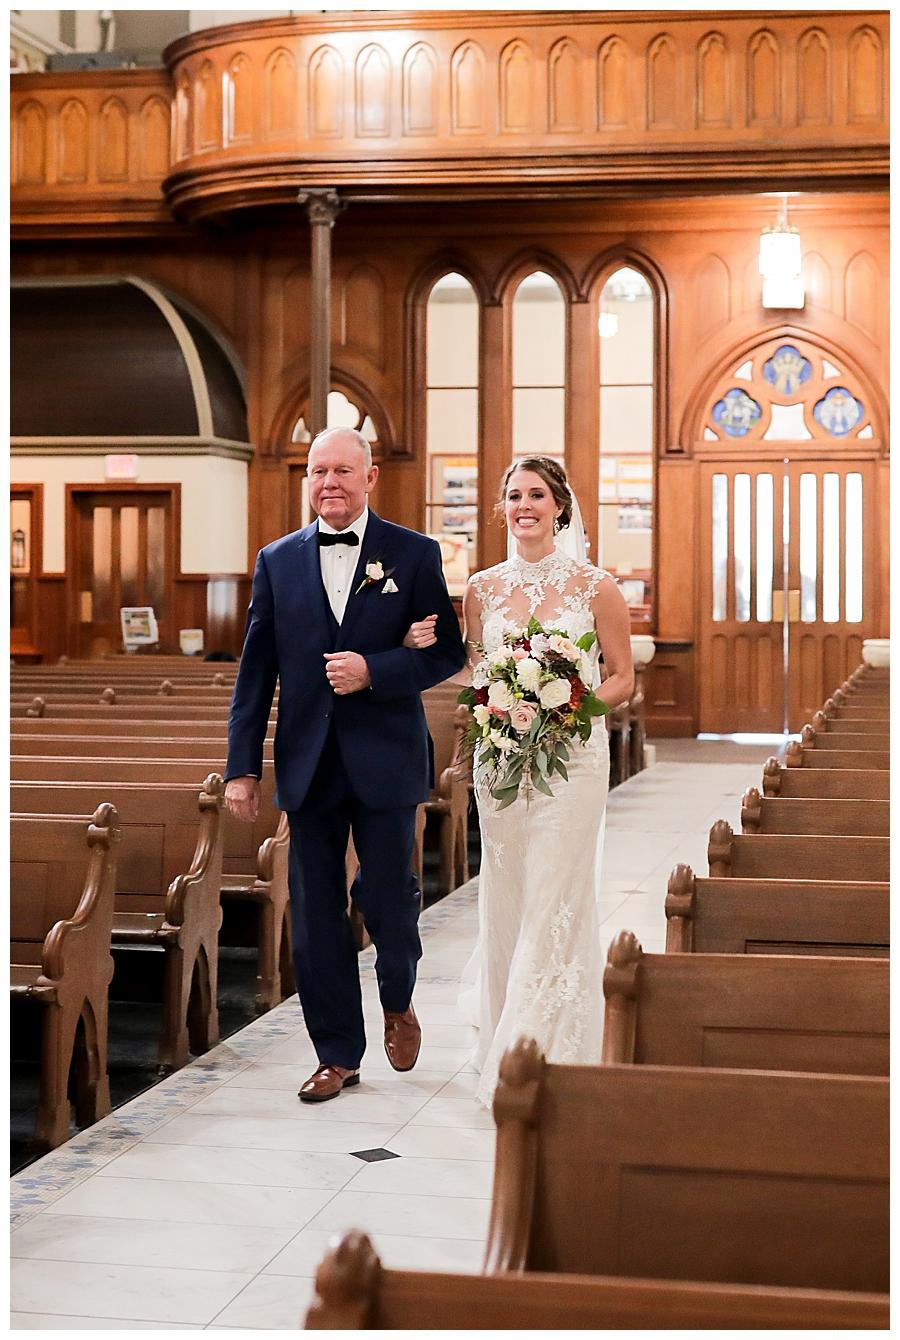 Indianapolis-Indiana-Wedding-Photography-Meghan-Harrison_0326.jpg